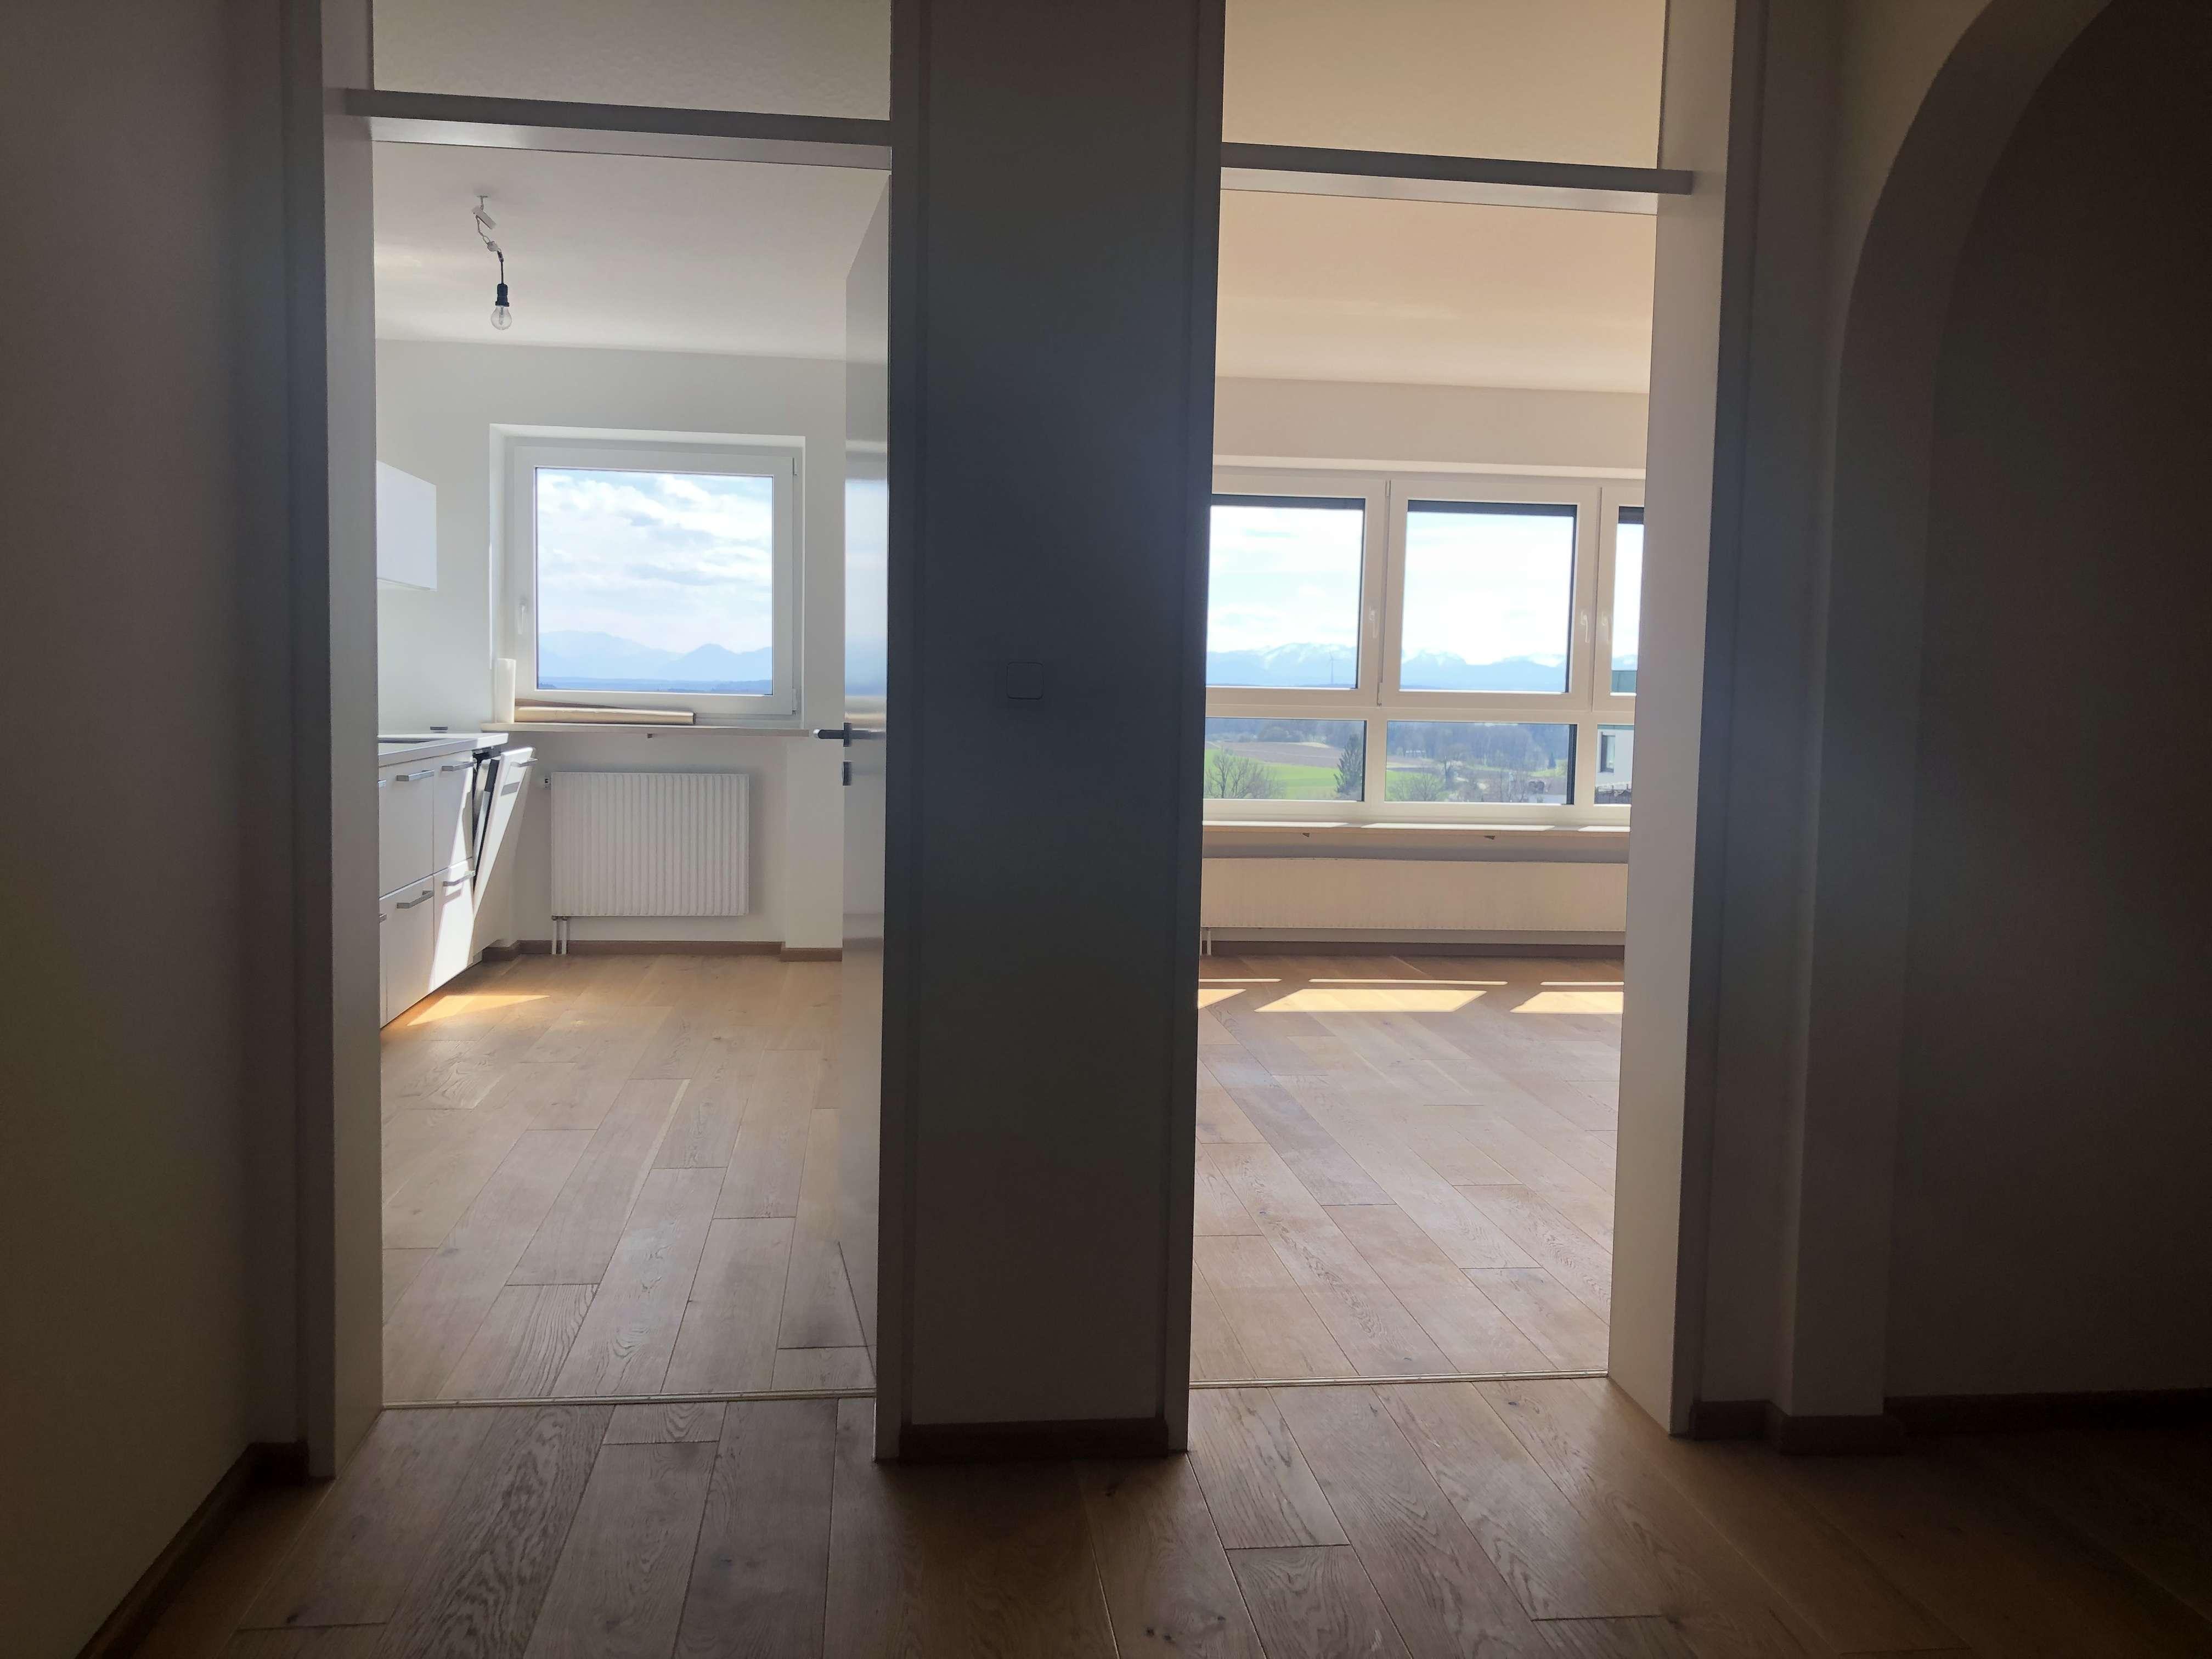 Traumhafte drei Zimmer Wohnung mit Alpenblick in Ebersberg (Kreis), Ebersberg